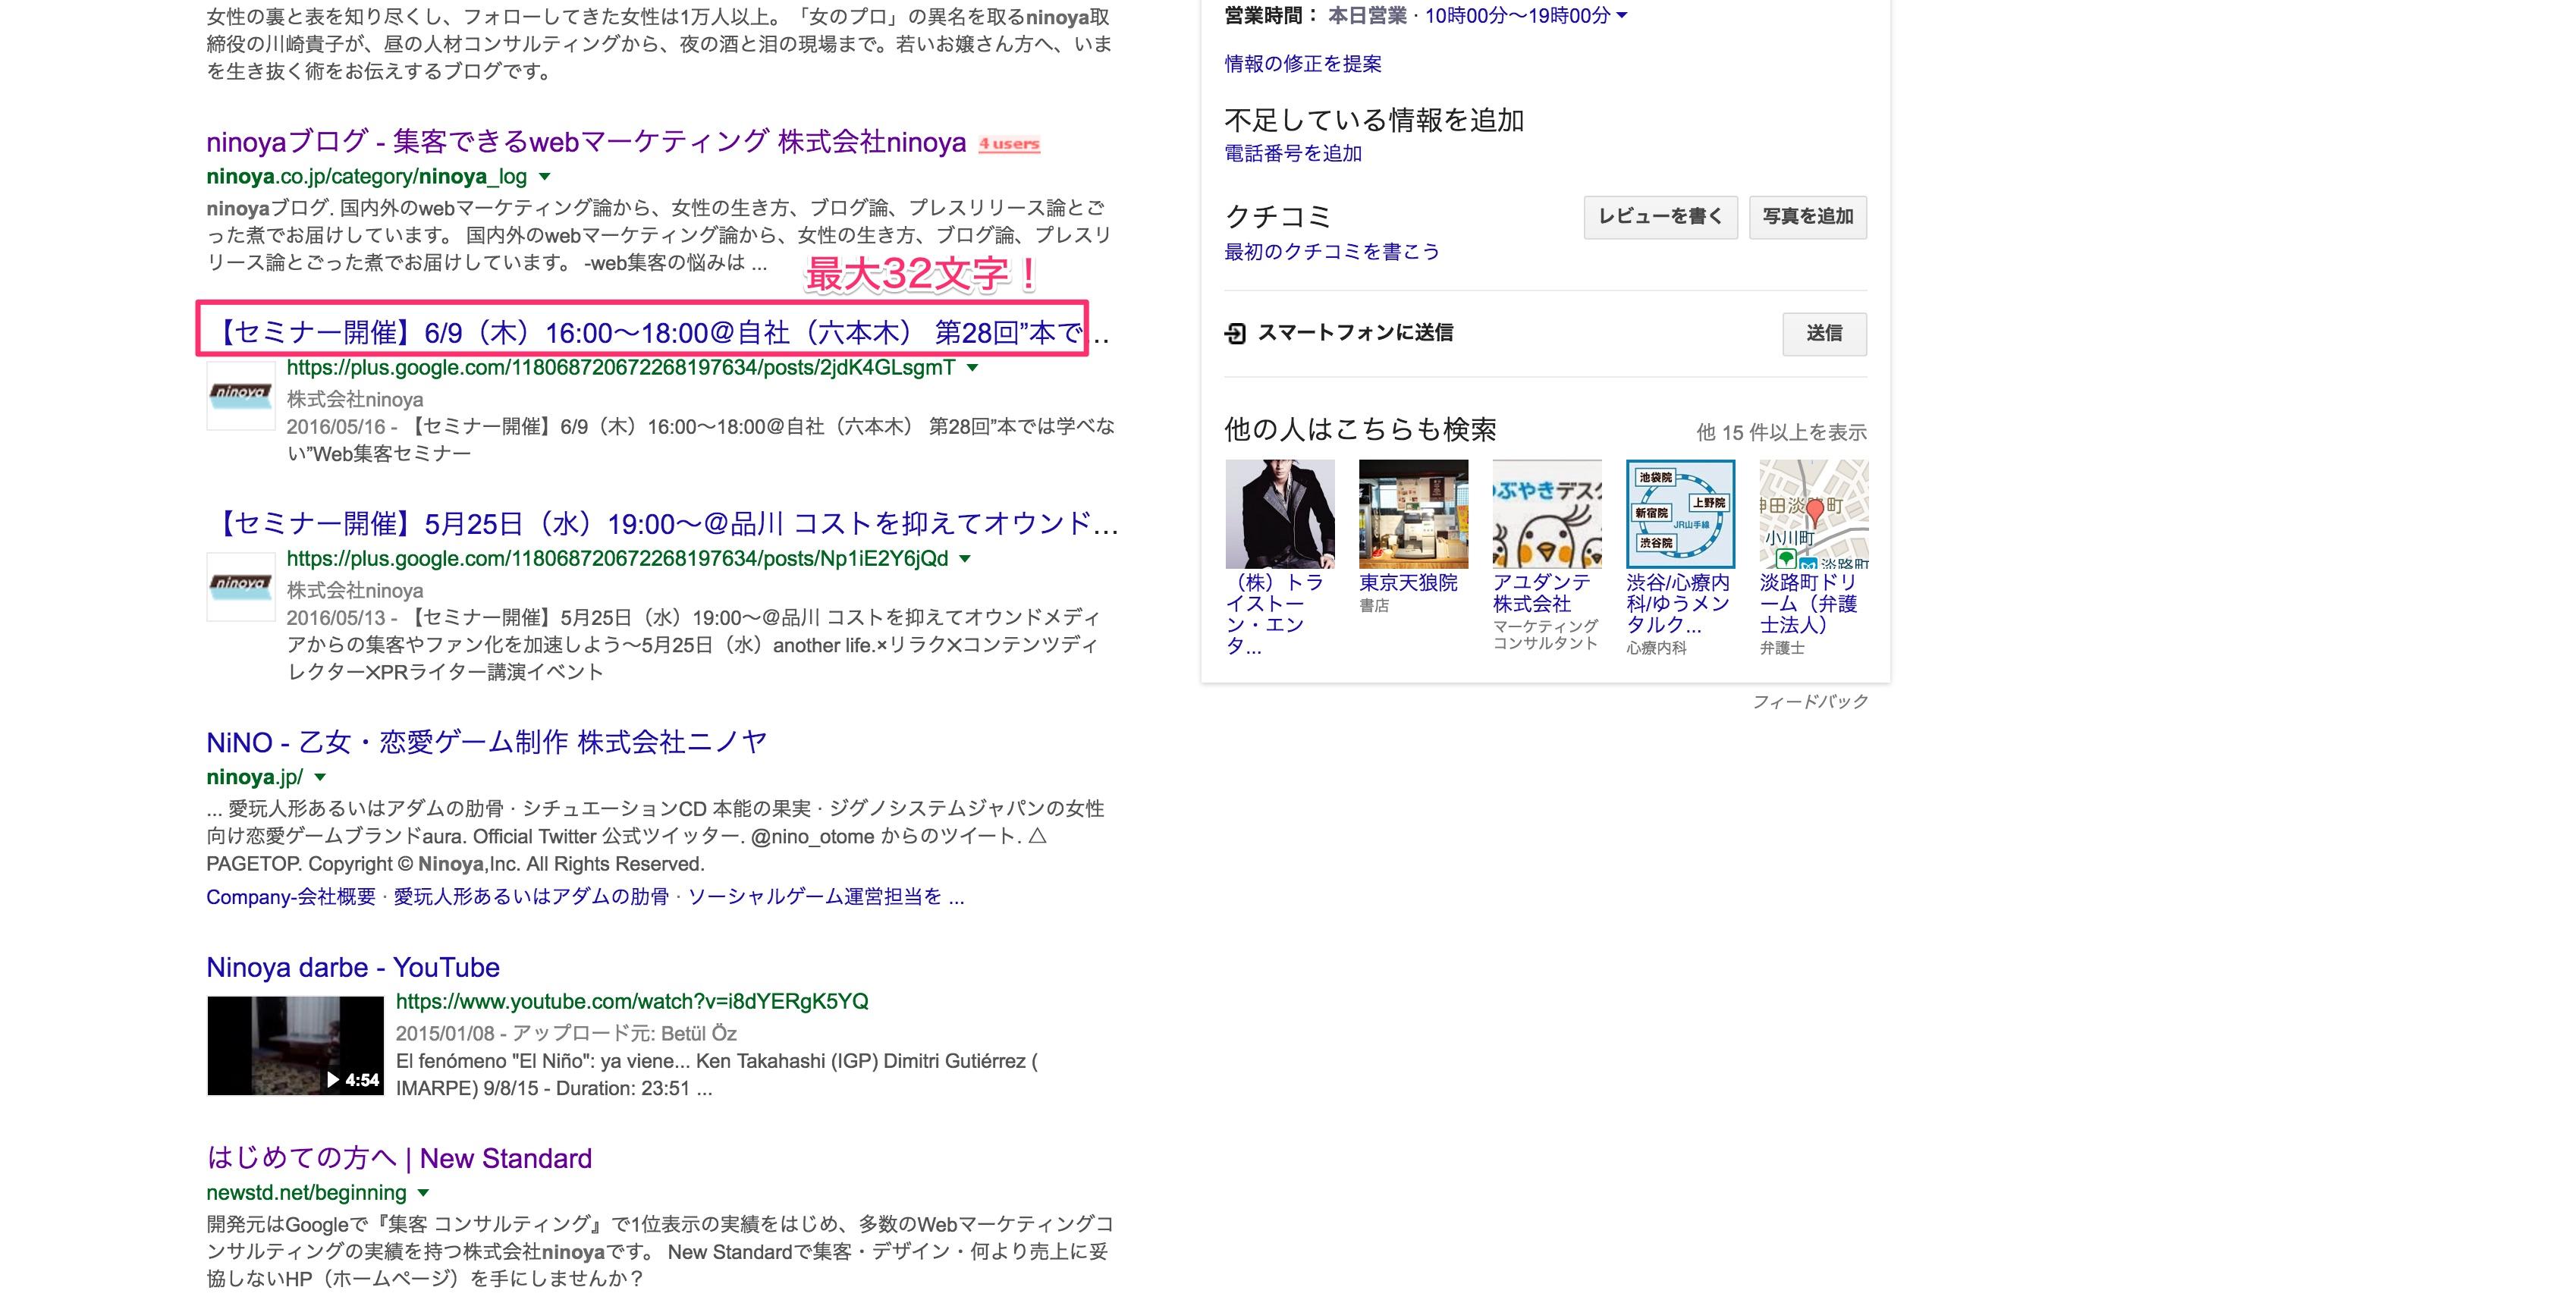 ninoya___Google_検索